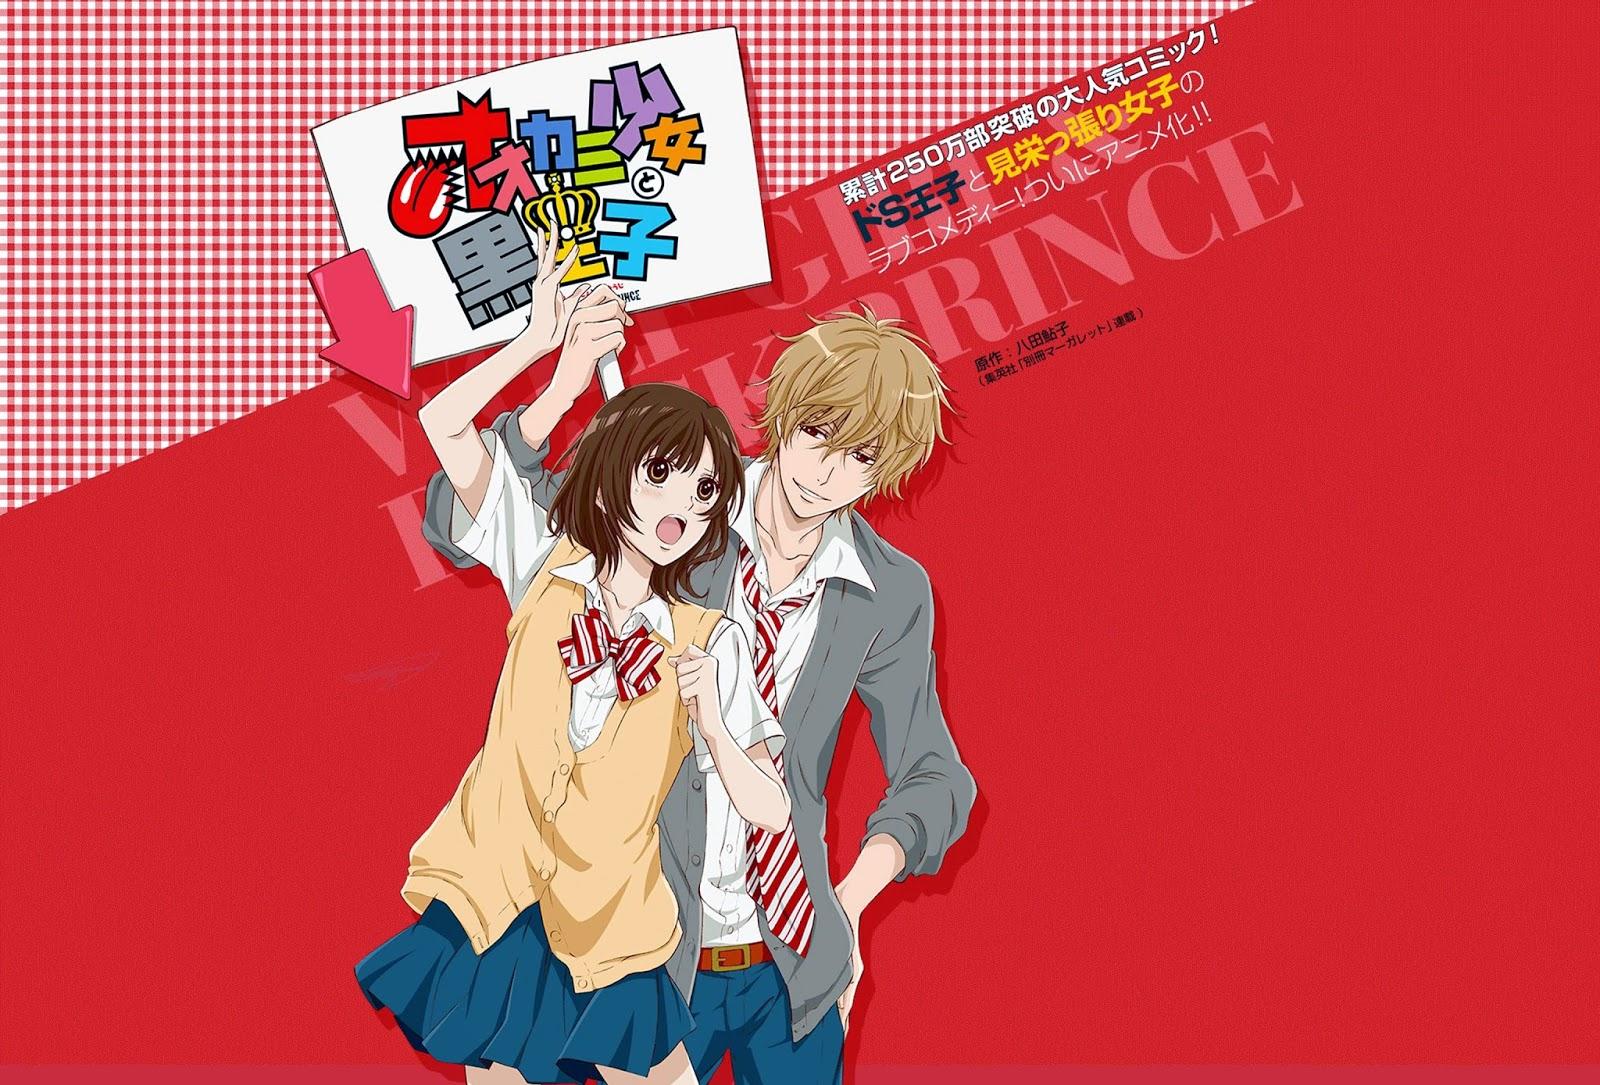 Anime Romance Wallpaper El Anime Quot Ookami Shoujo To Kuro Ouji Quot Se Estrenar 225 En